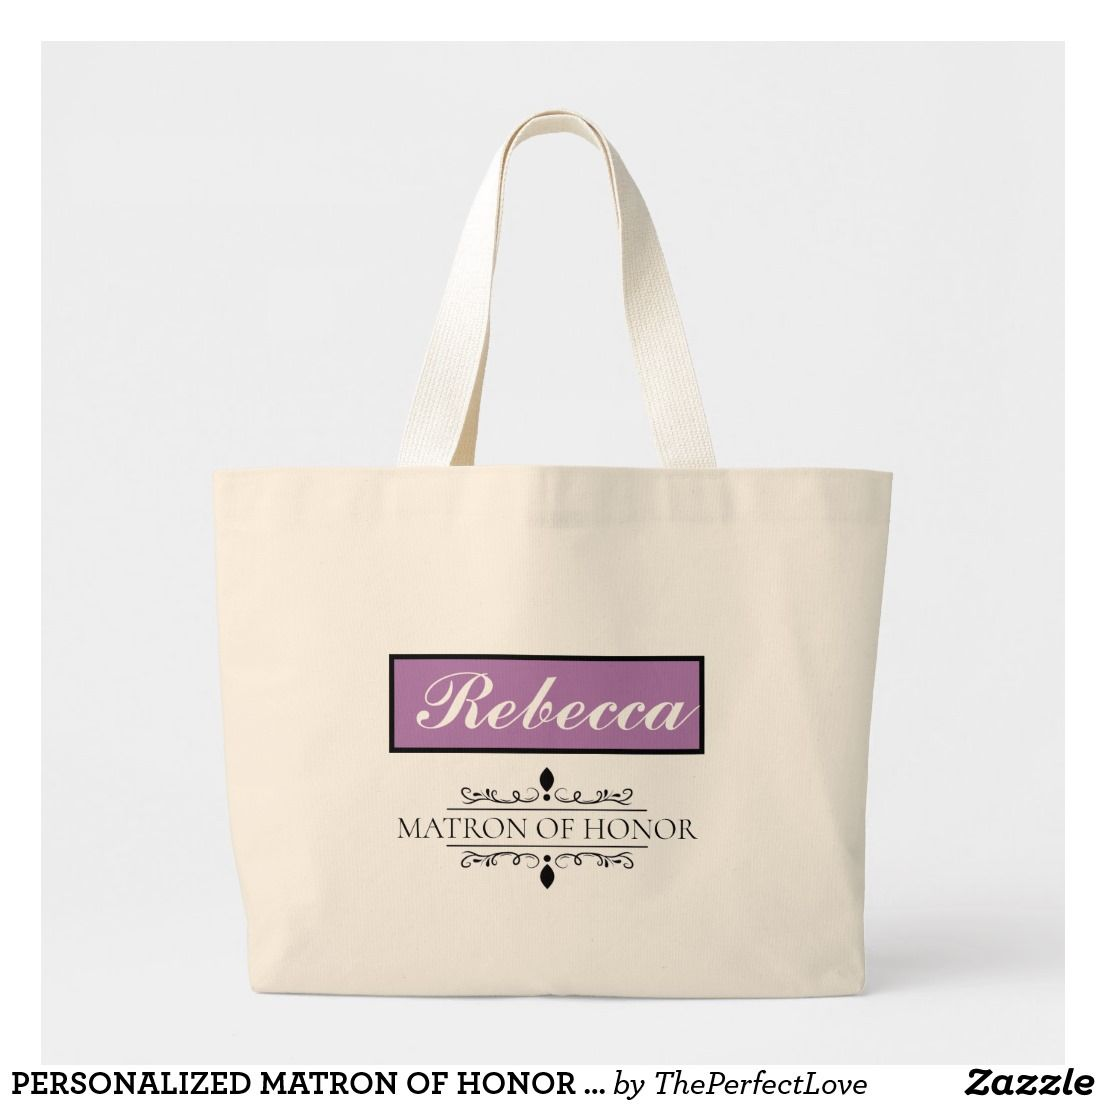 Personalized Matron Of Honor Jumbo Tote Bag Zazzle Com Bridesmaids Personalized Wedding Tote Personalized Wedding Gifts